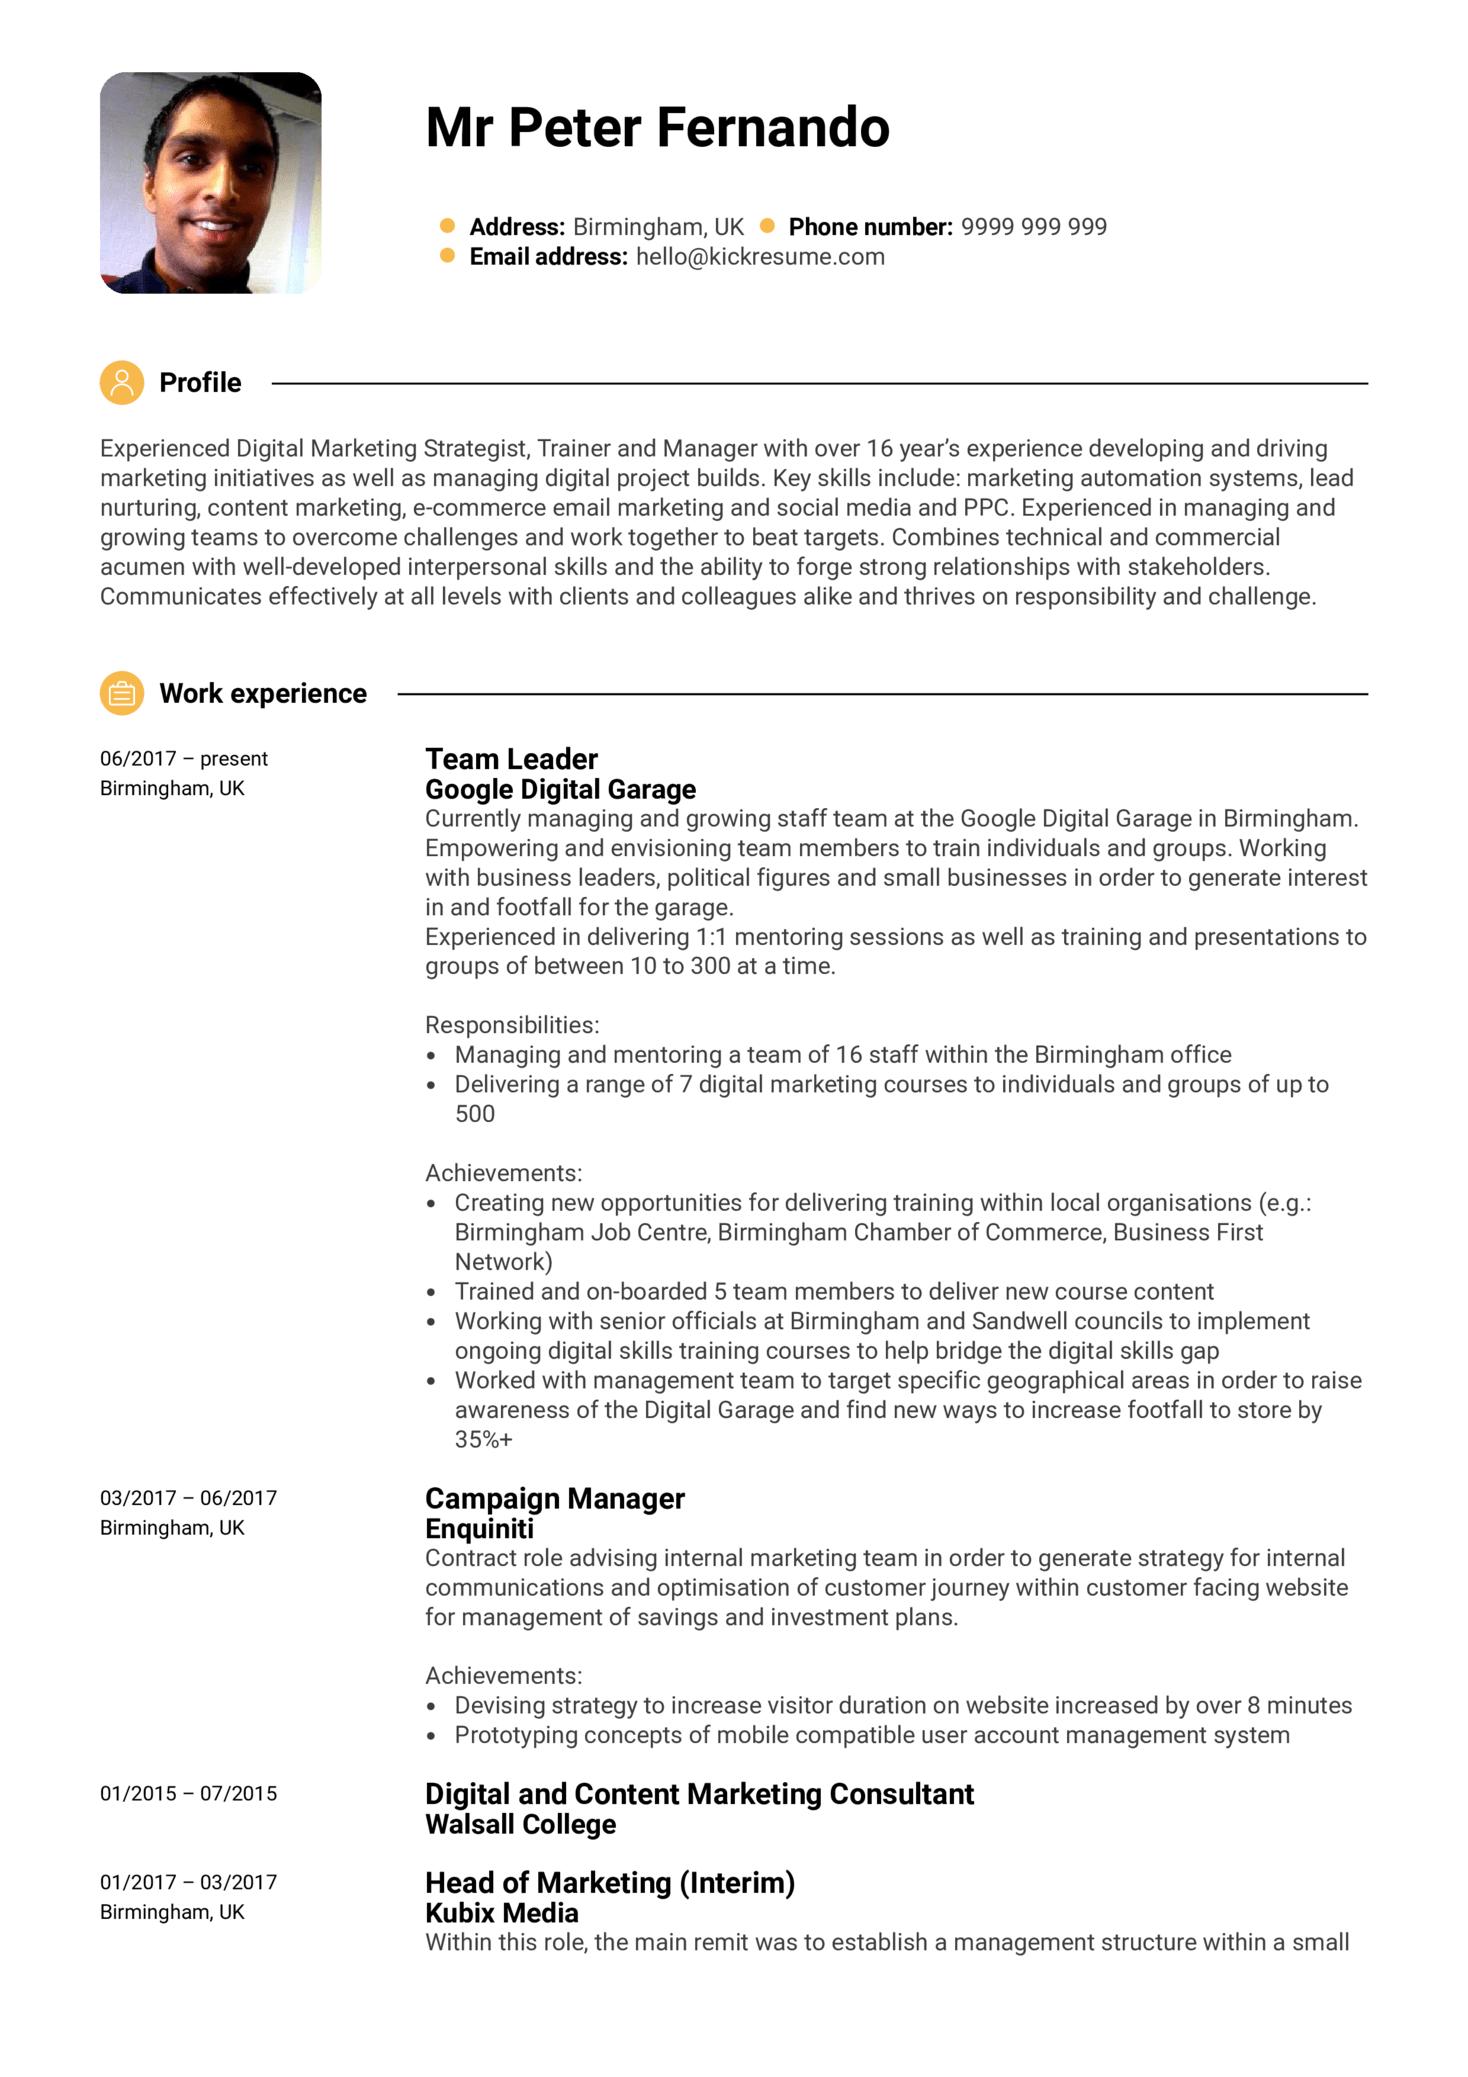 Google Team Leader Resume Sample (Part 1)